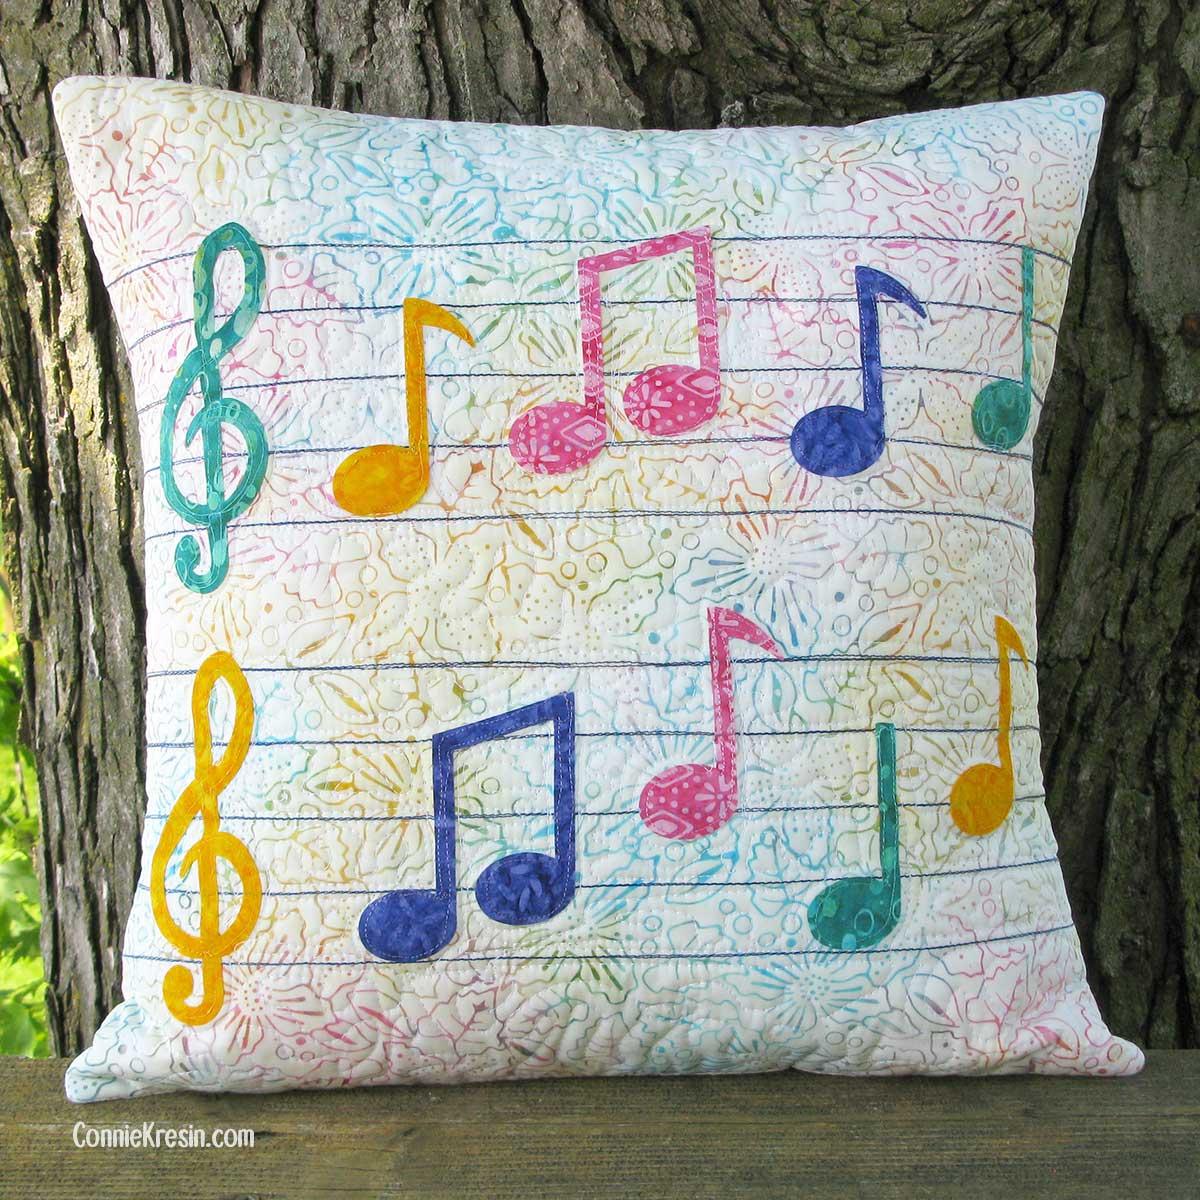 Applique Musical Pillow on deck rail